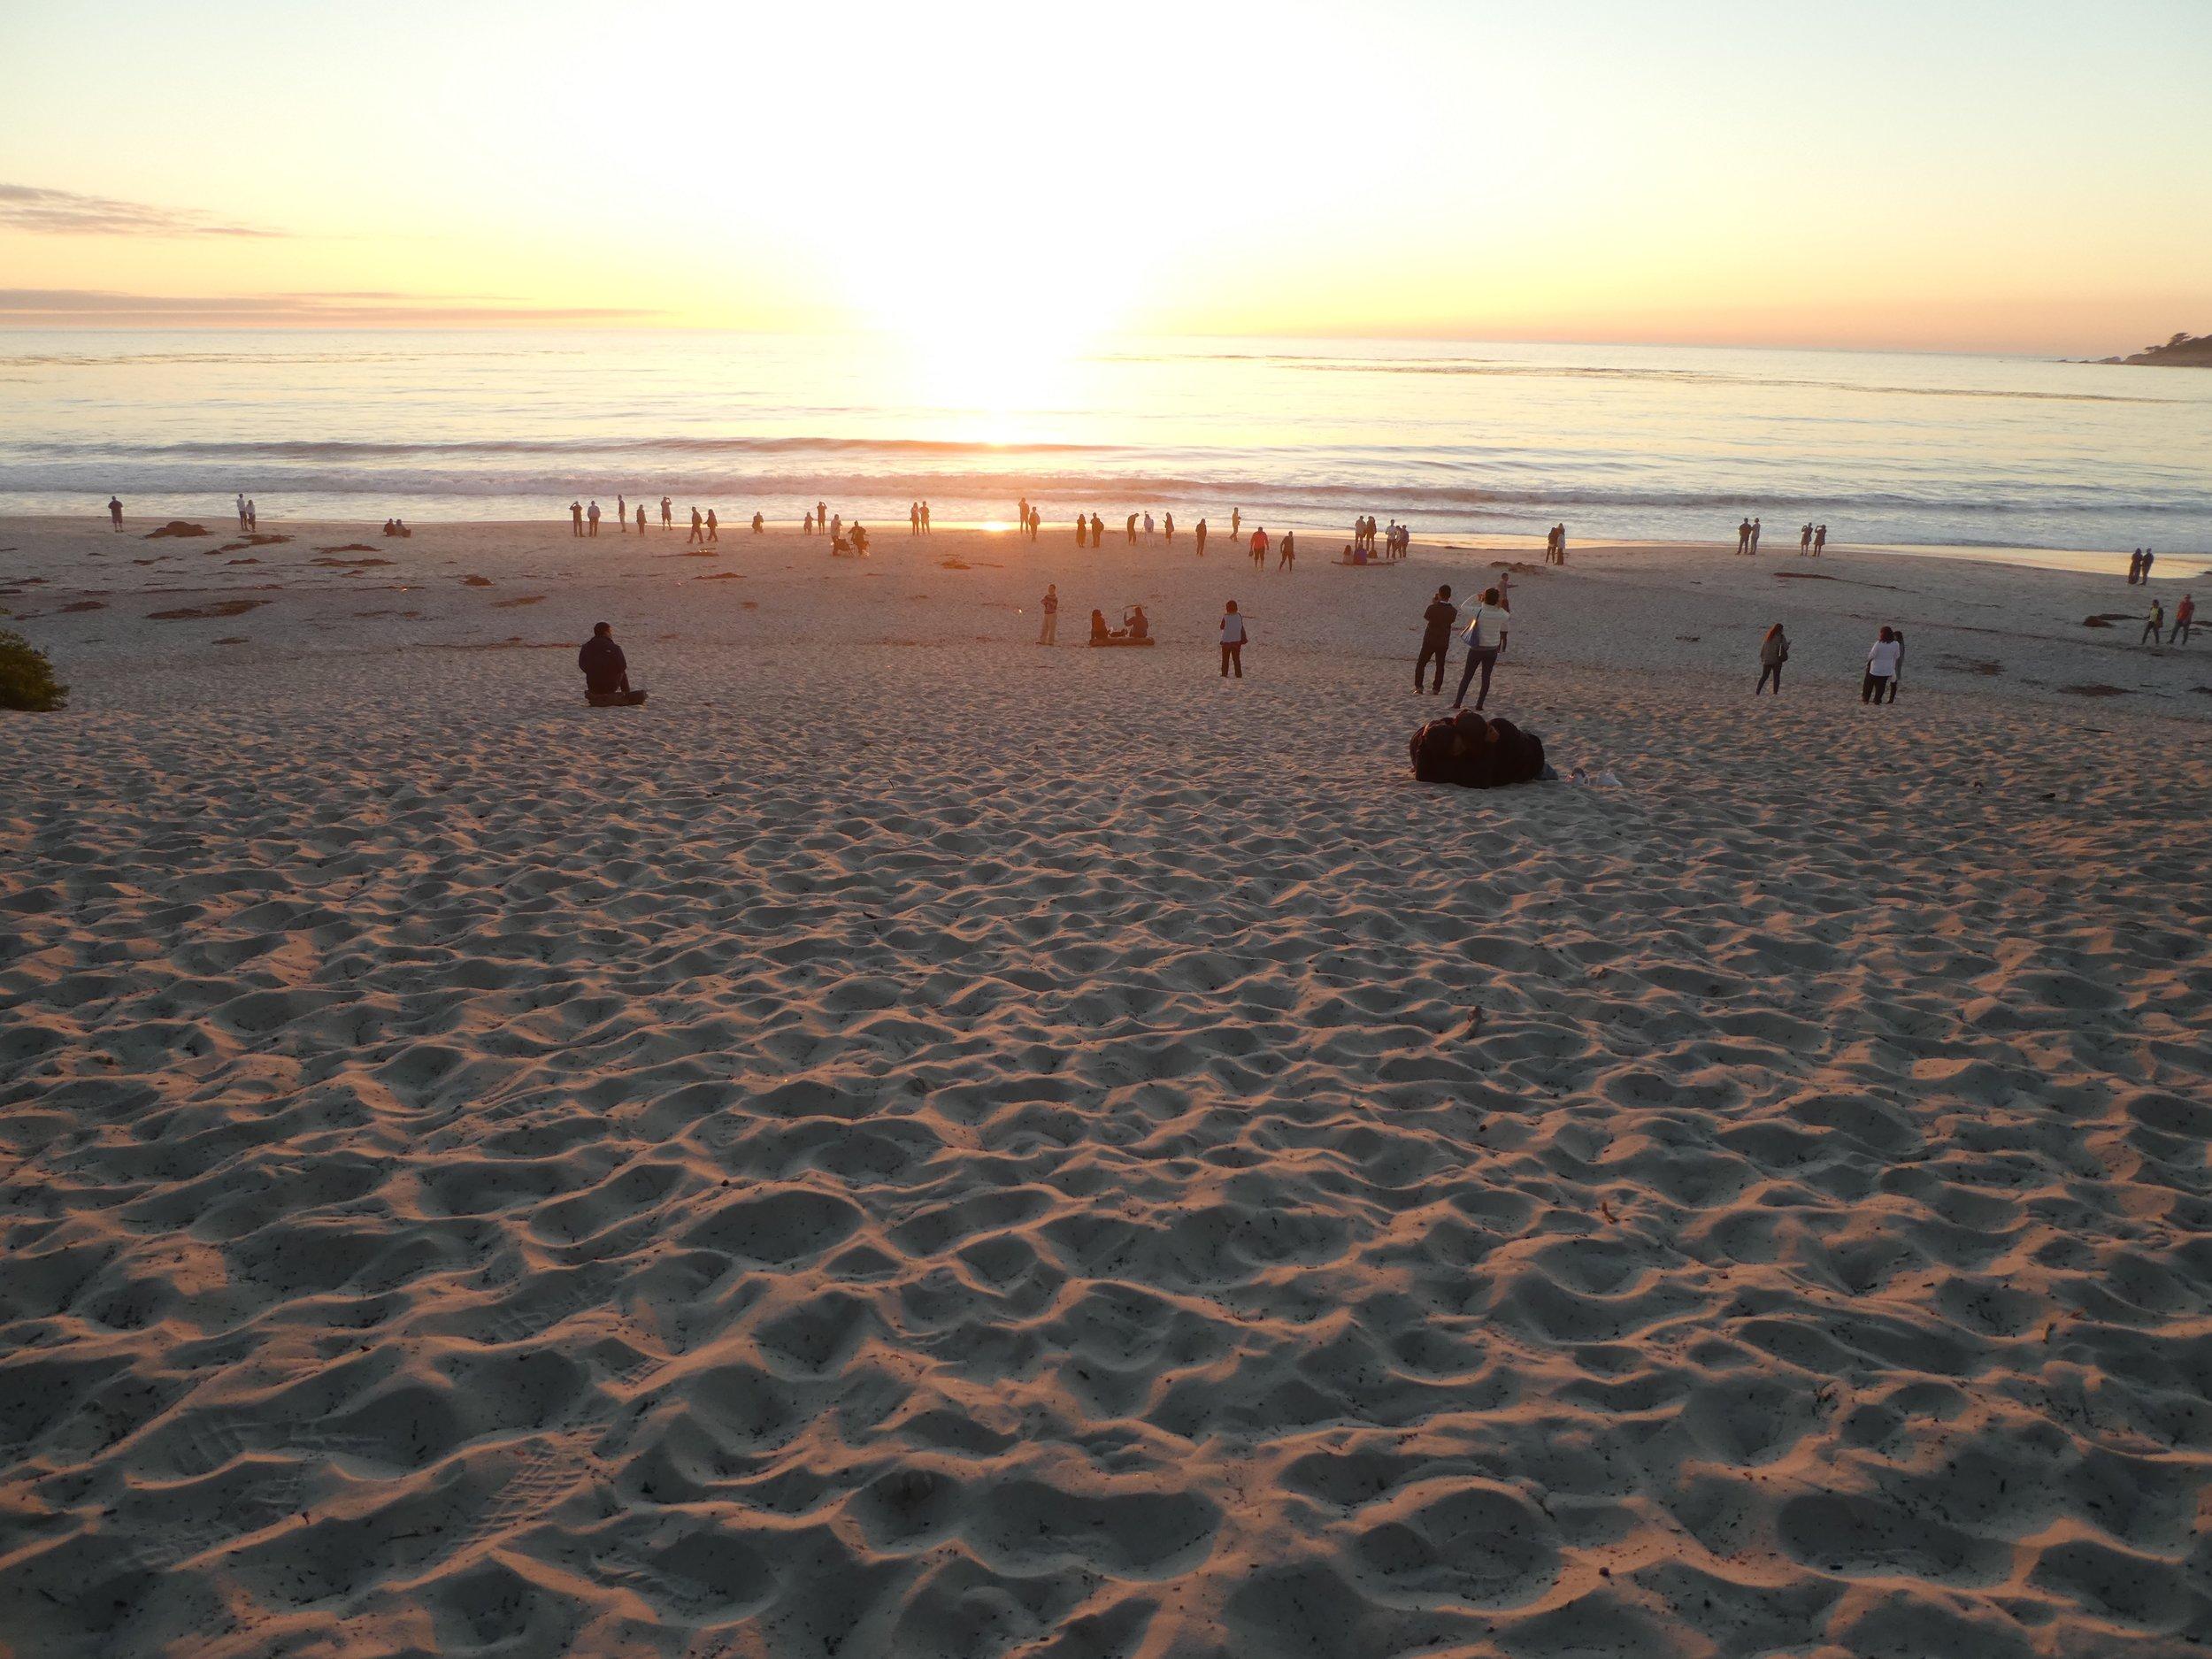 carmel-sunset-beach-sea-california.jpg